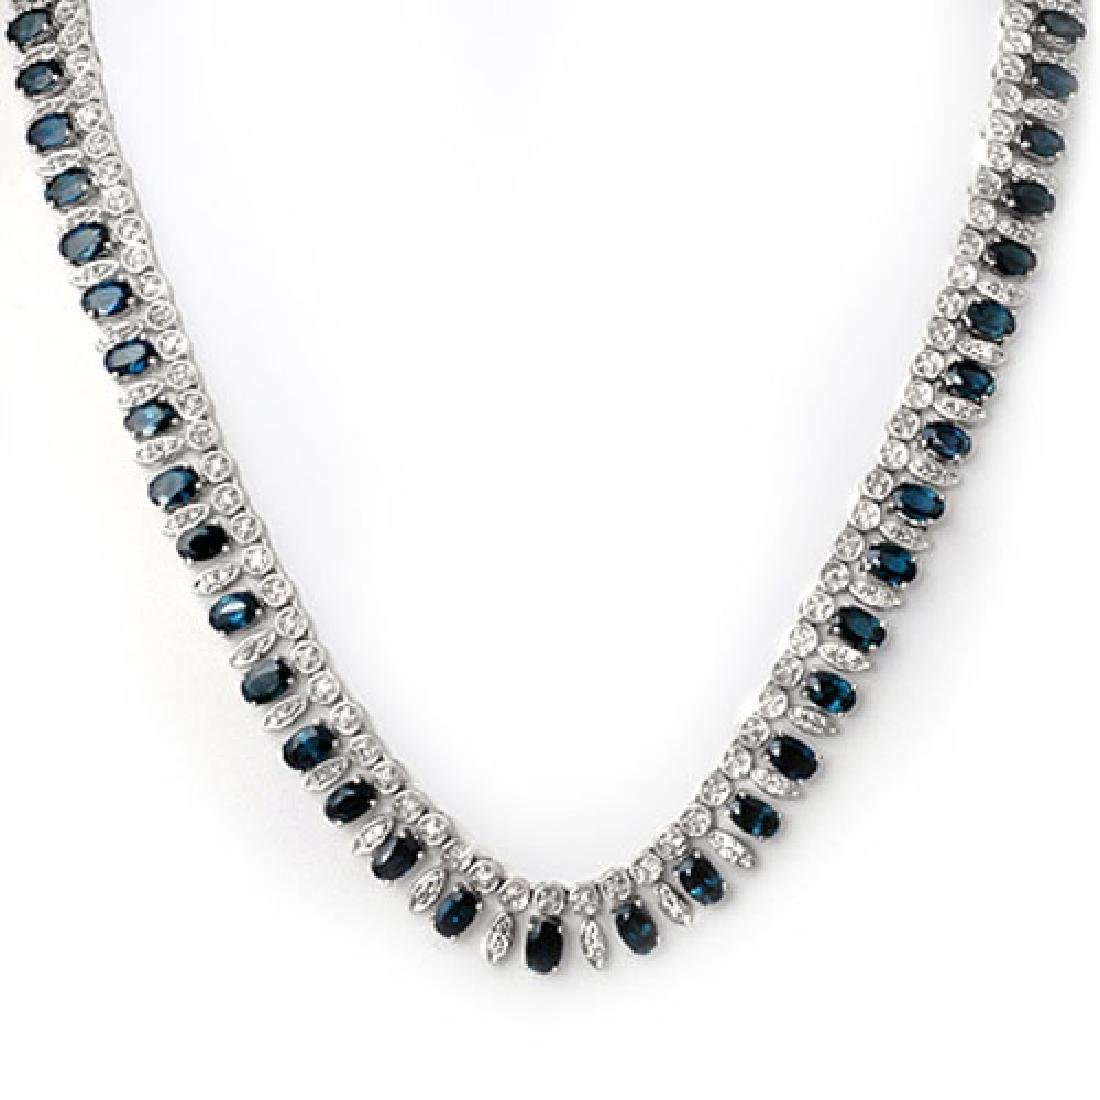 26 CTW Blue Sapphire & Diamond Necklace 14K White Gold